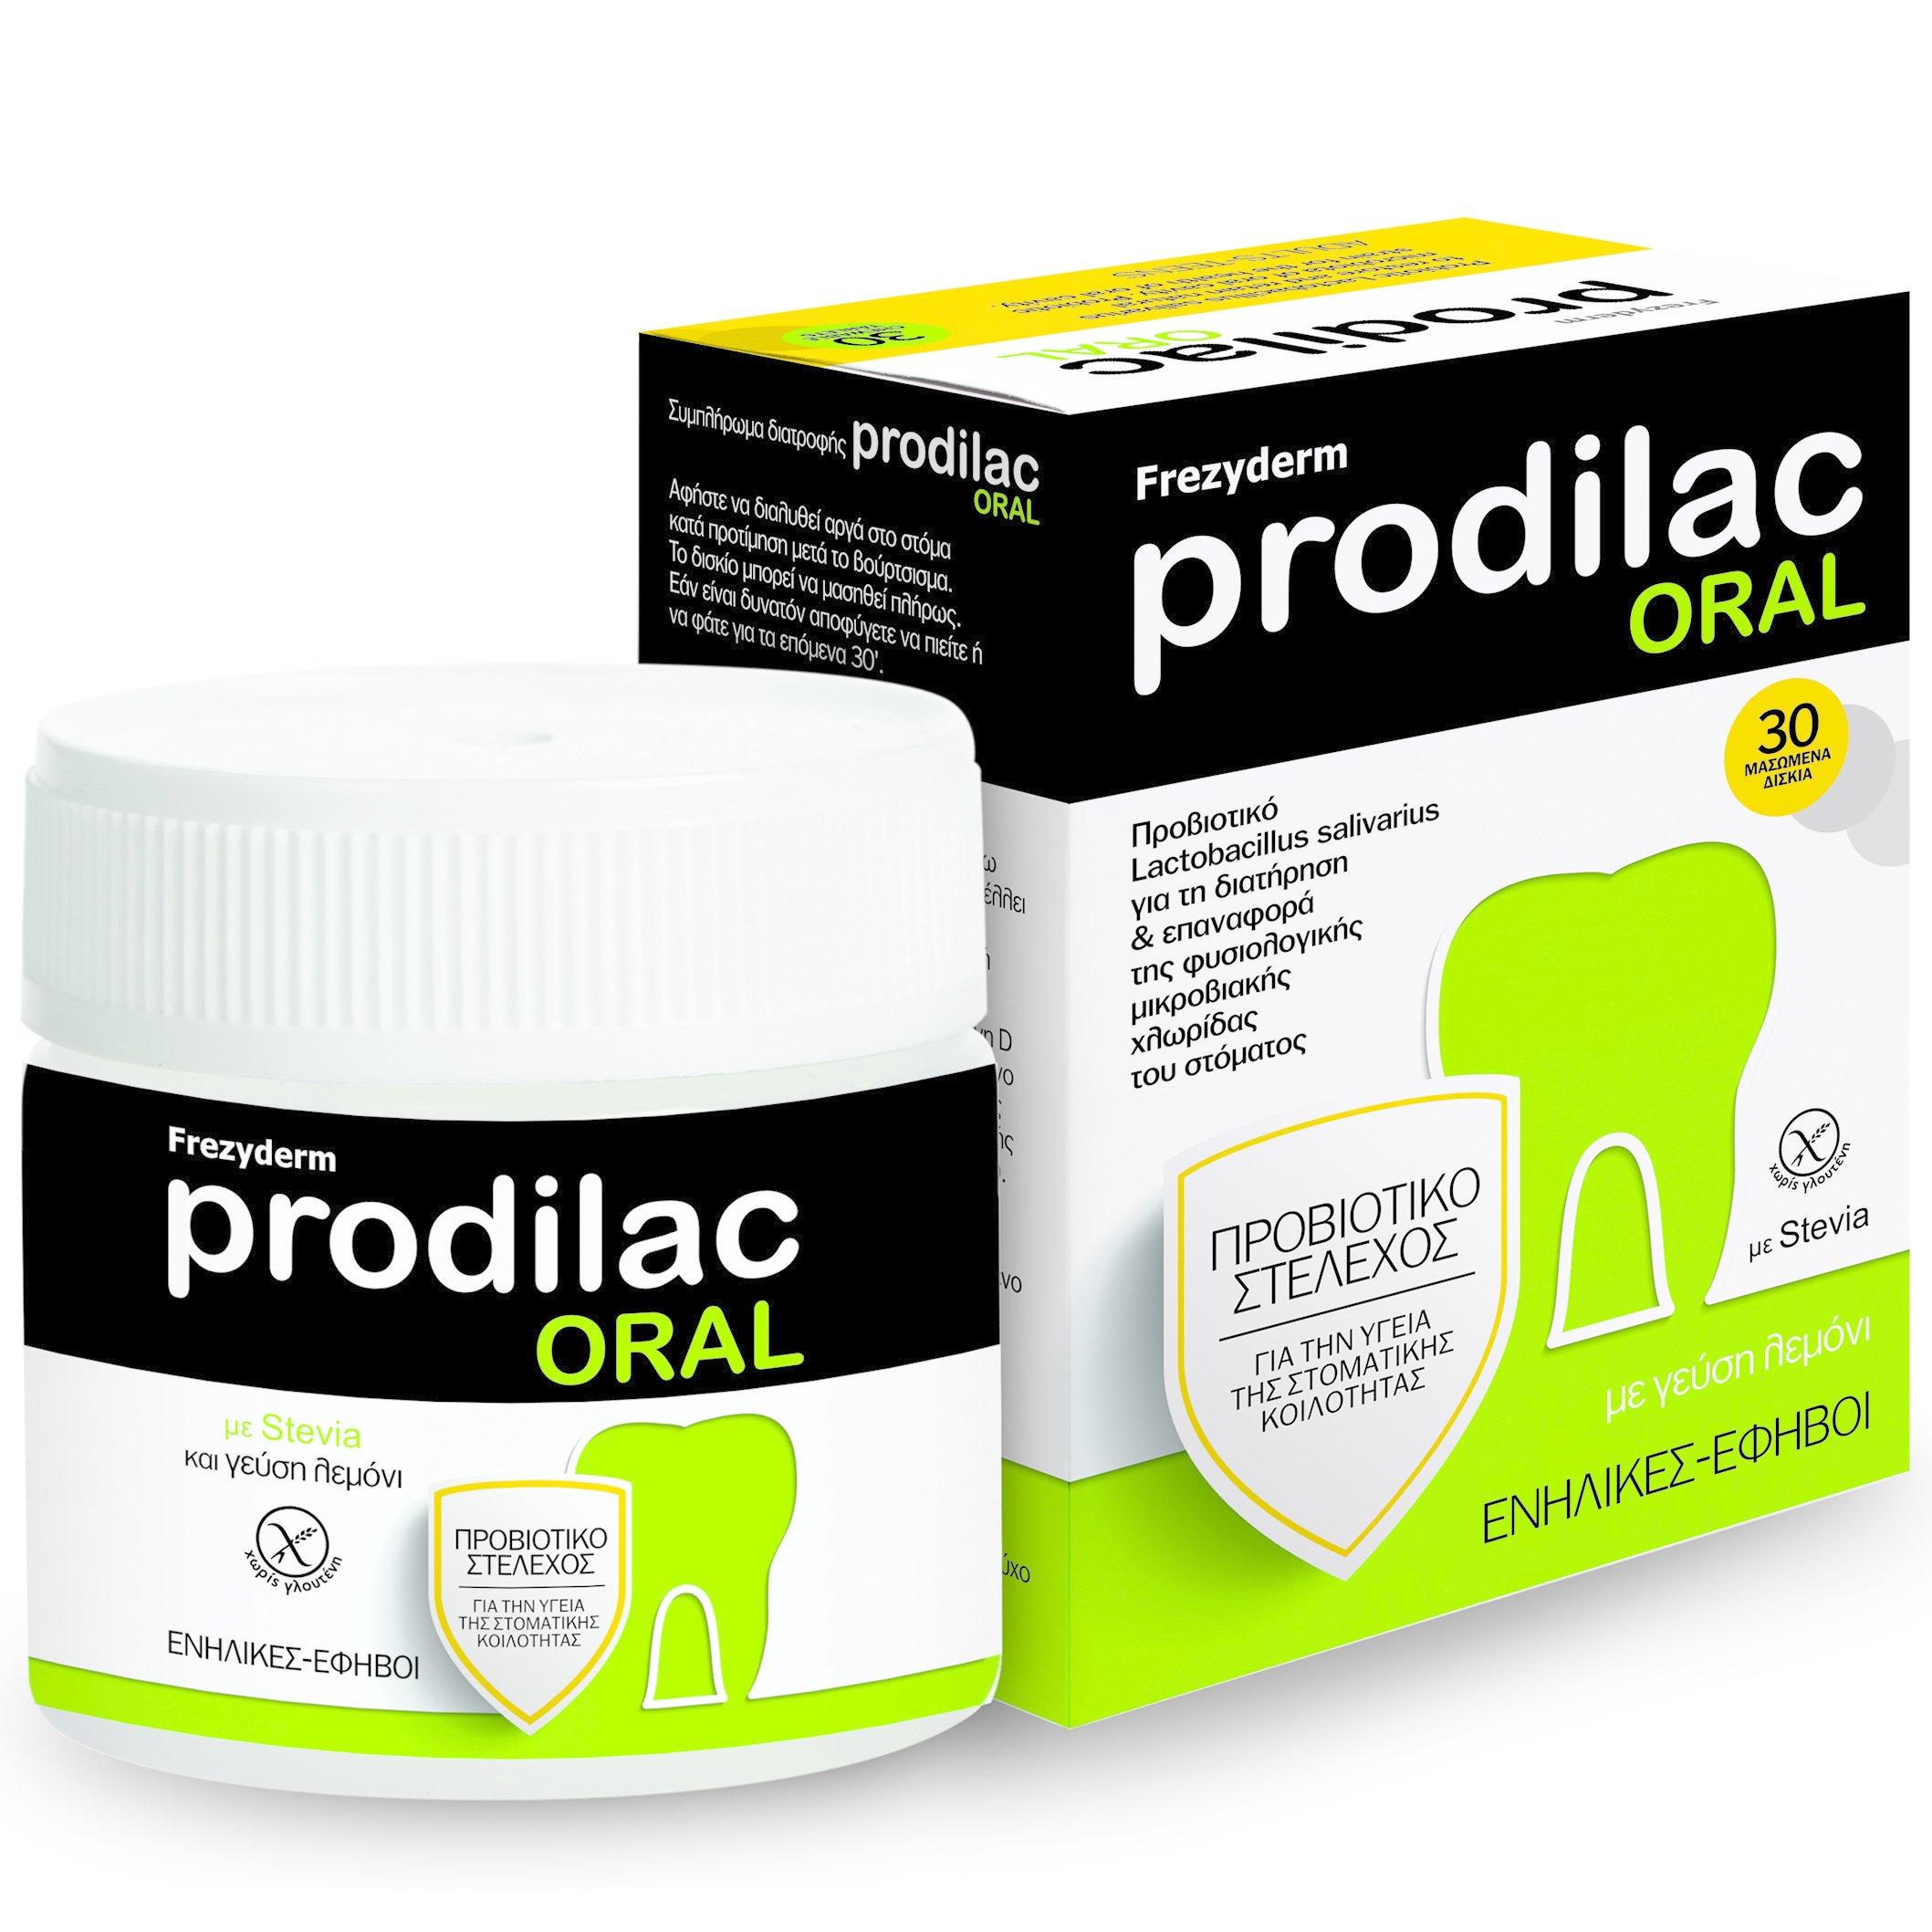 Frezyderm Prodilac Oral Προβιοτικά 30 Μασώμενες Παστίλιες